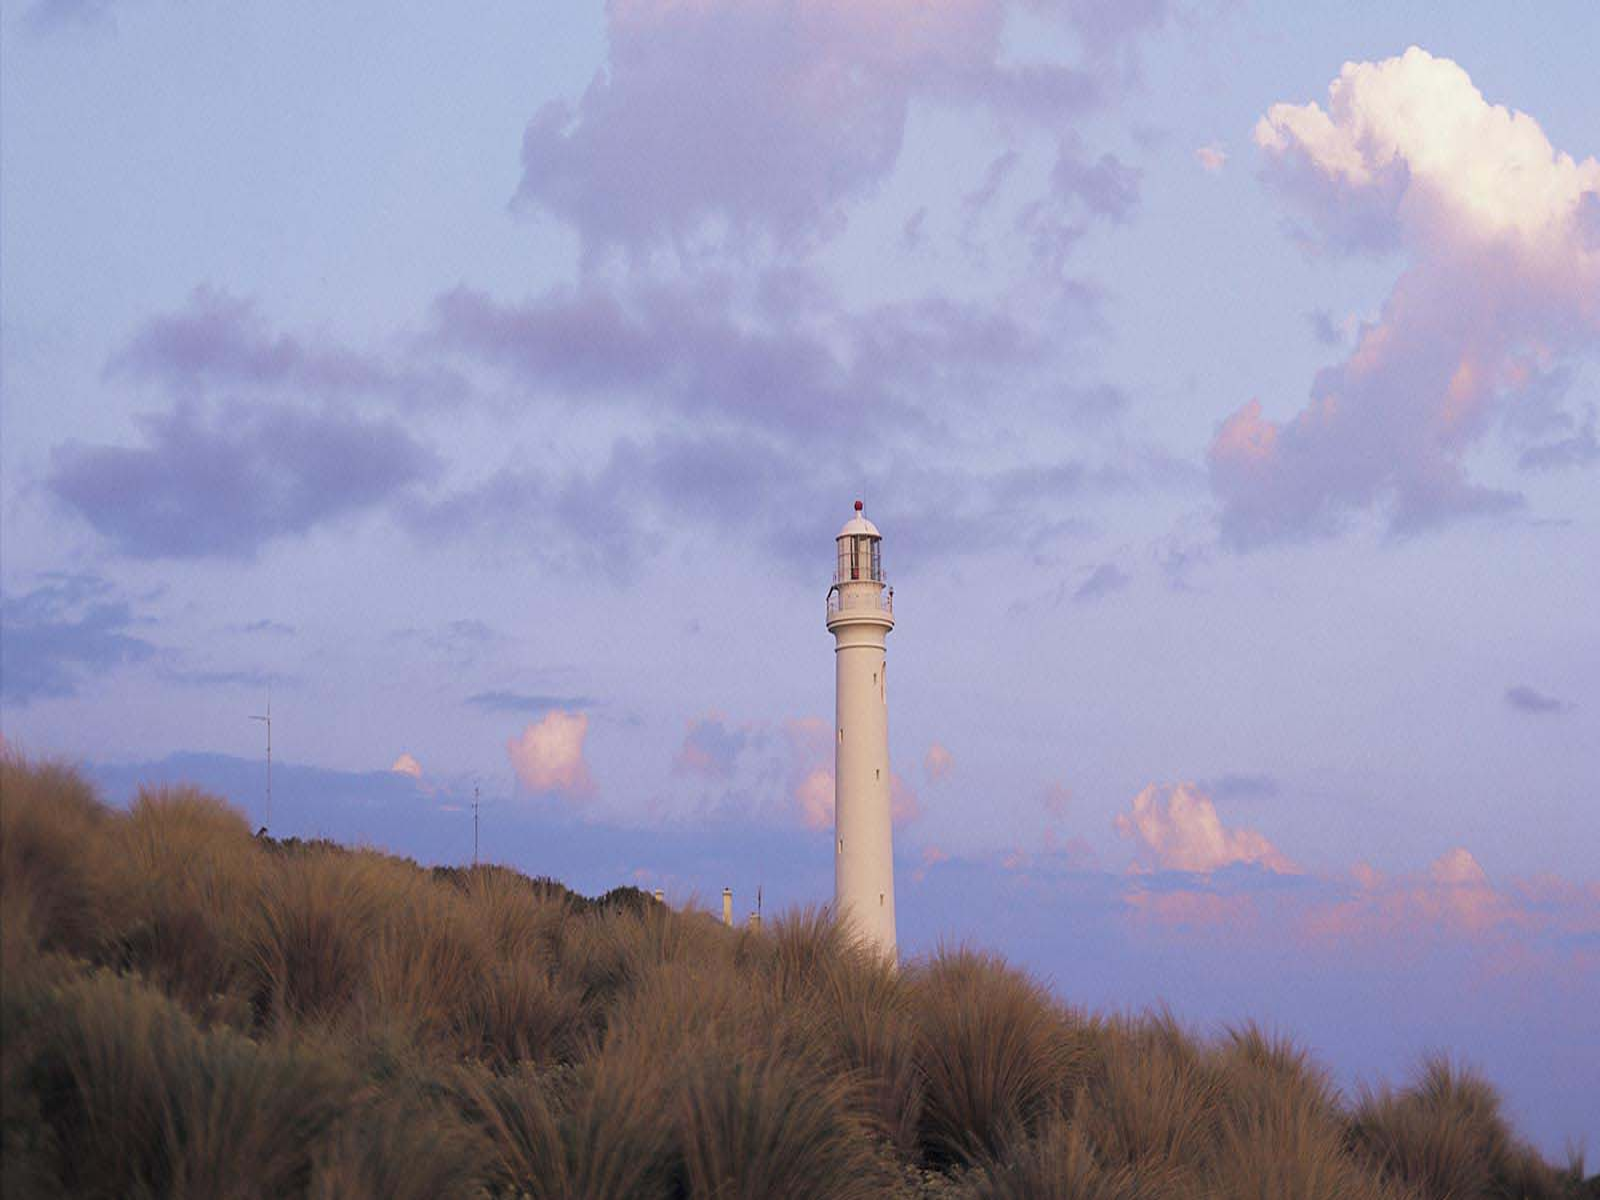 Point Hicks Light Station Reserve, Gippsland, Victoria, Australia